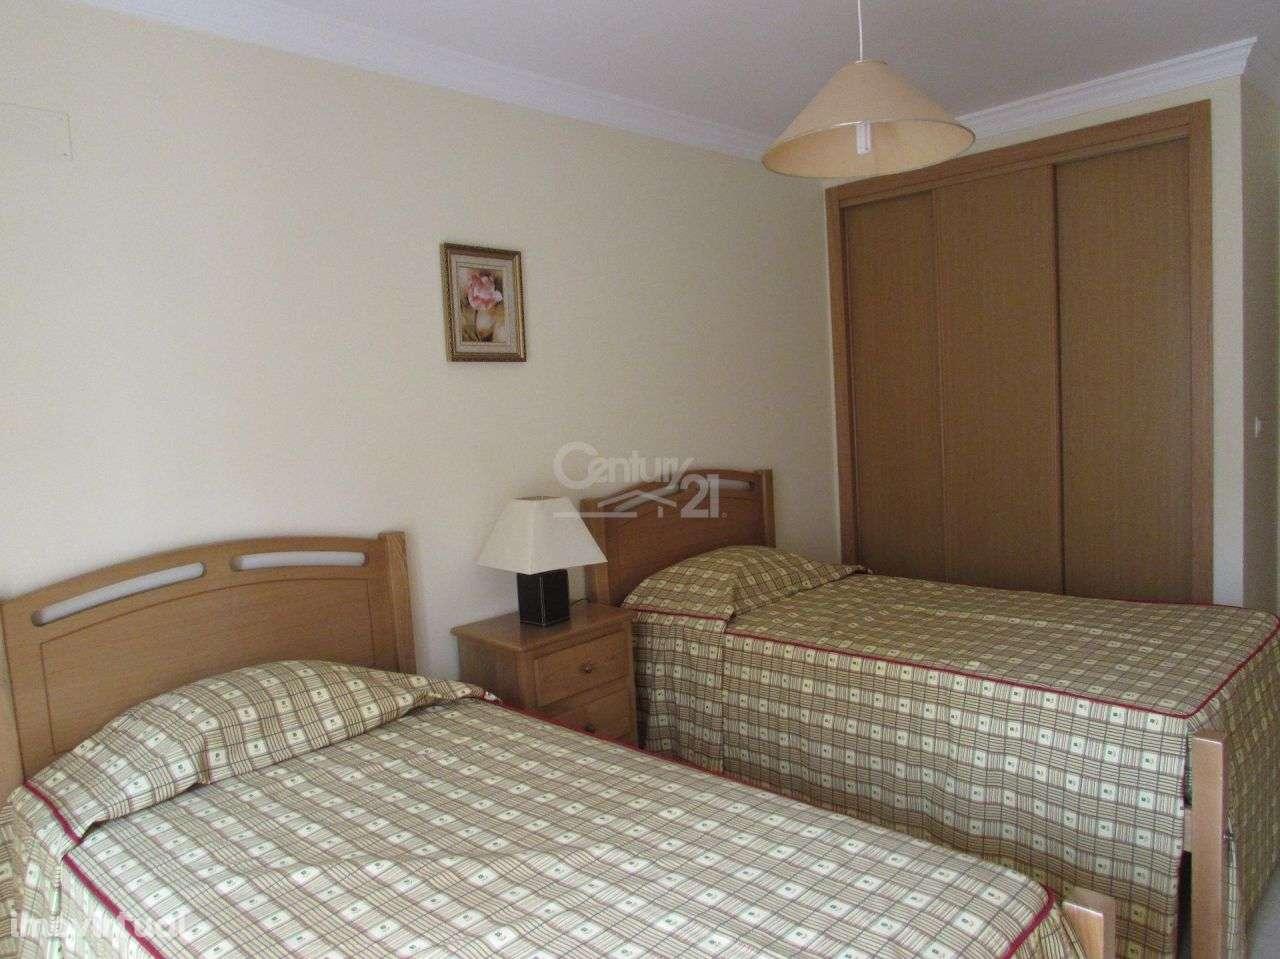 Apartamento para comprar, Monte Gordo, Faro - Foto 6